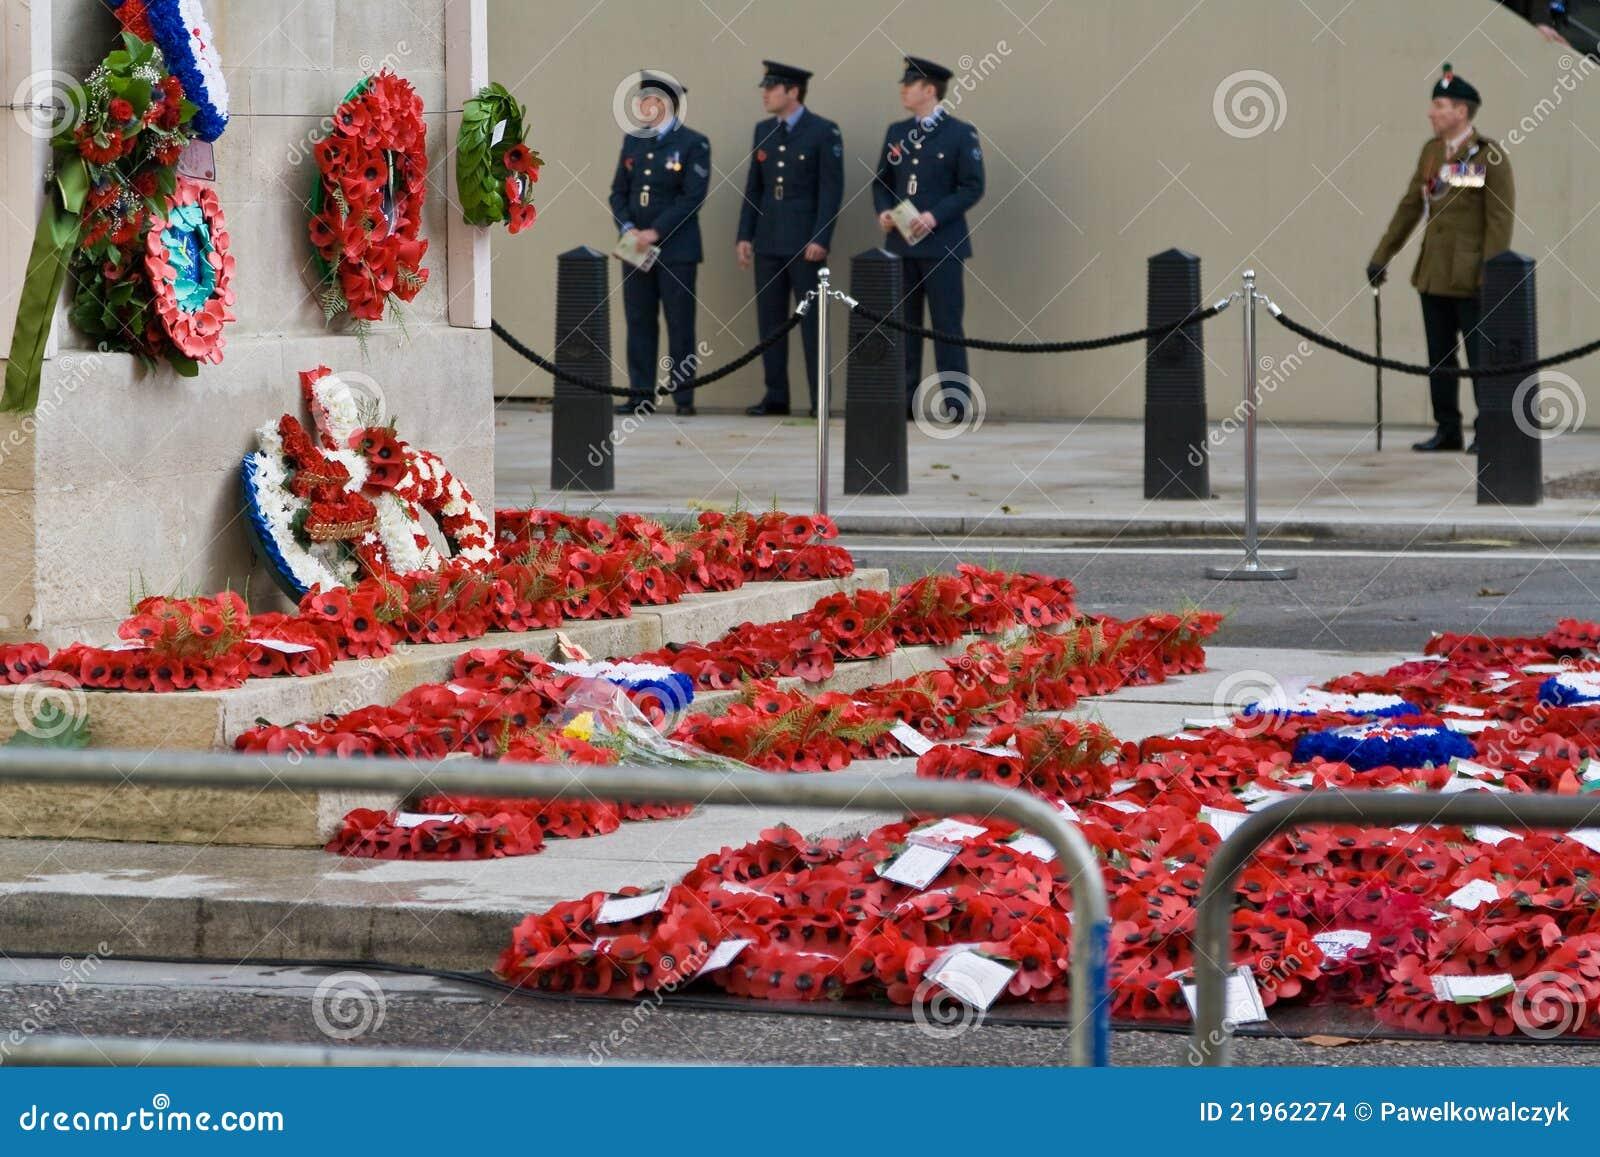 Poppy Appeal on Armistice Day, Whitehall, London.